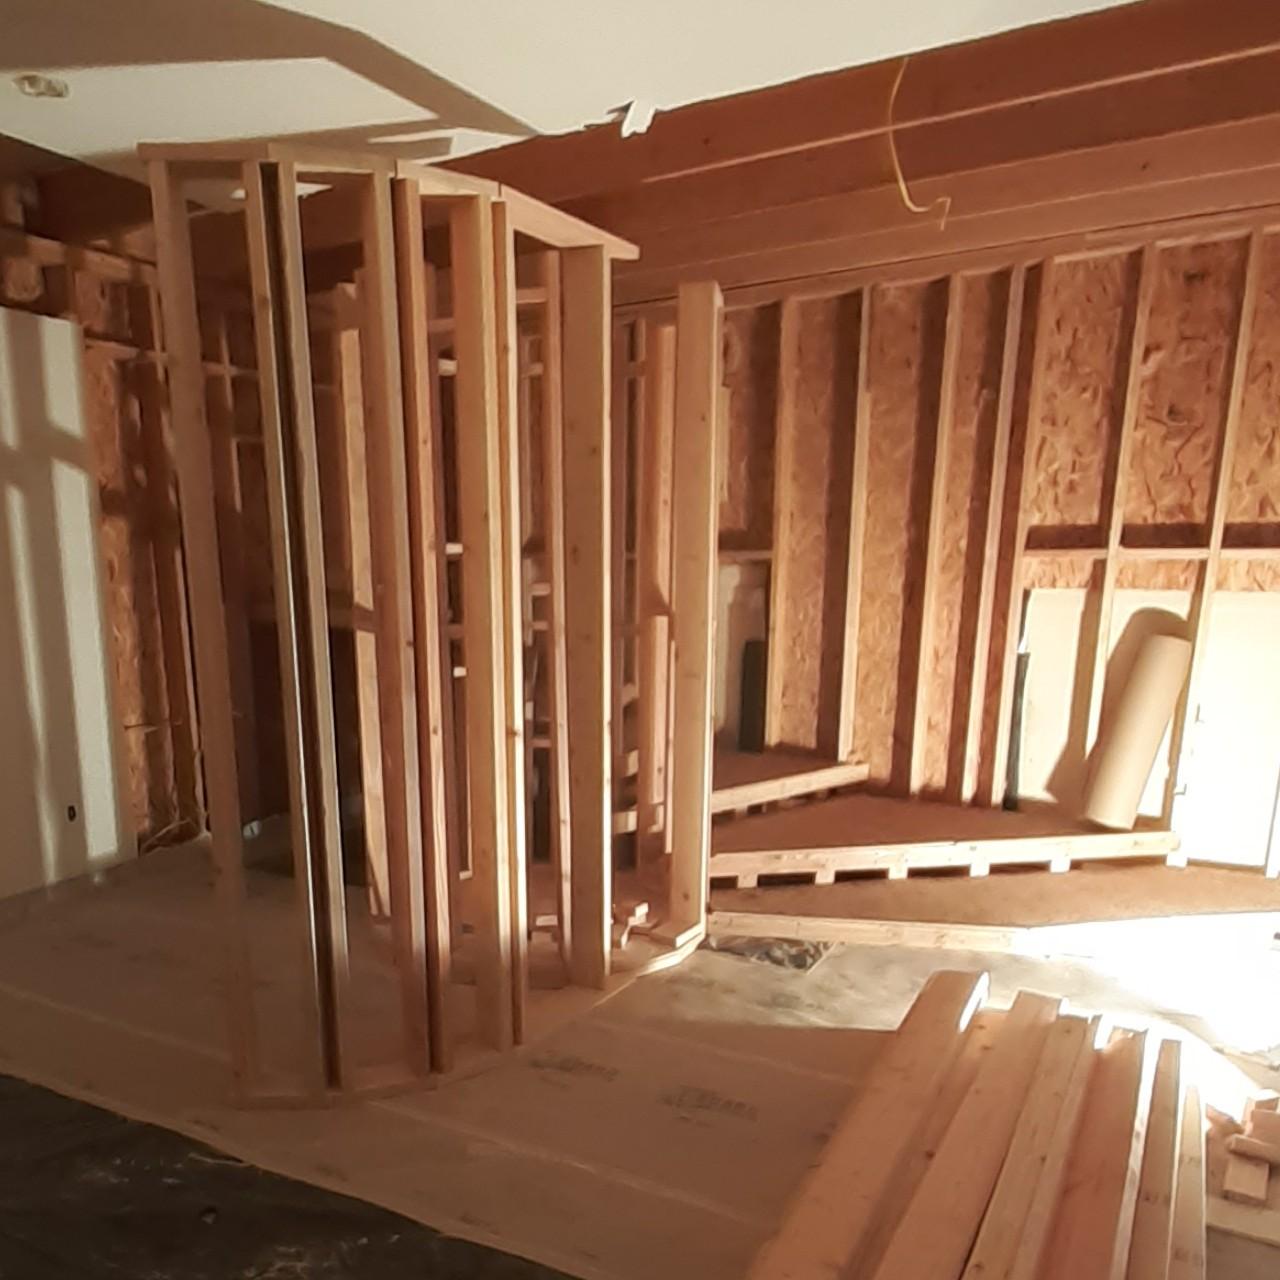 carpentry-wood-framing-second-floor-home-addition--framing-15